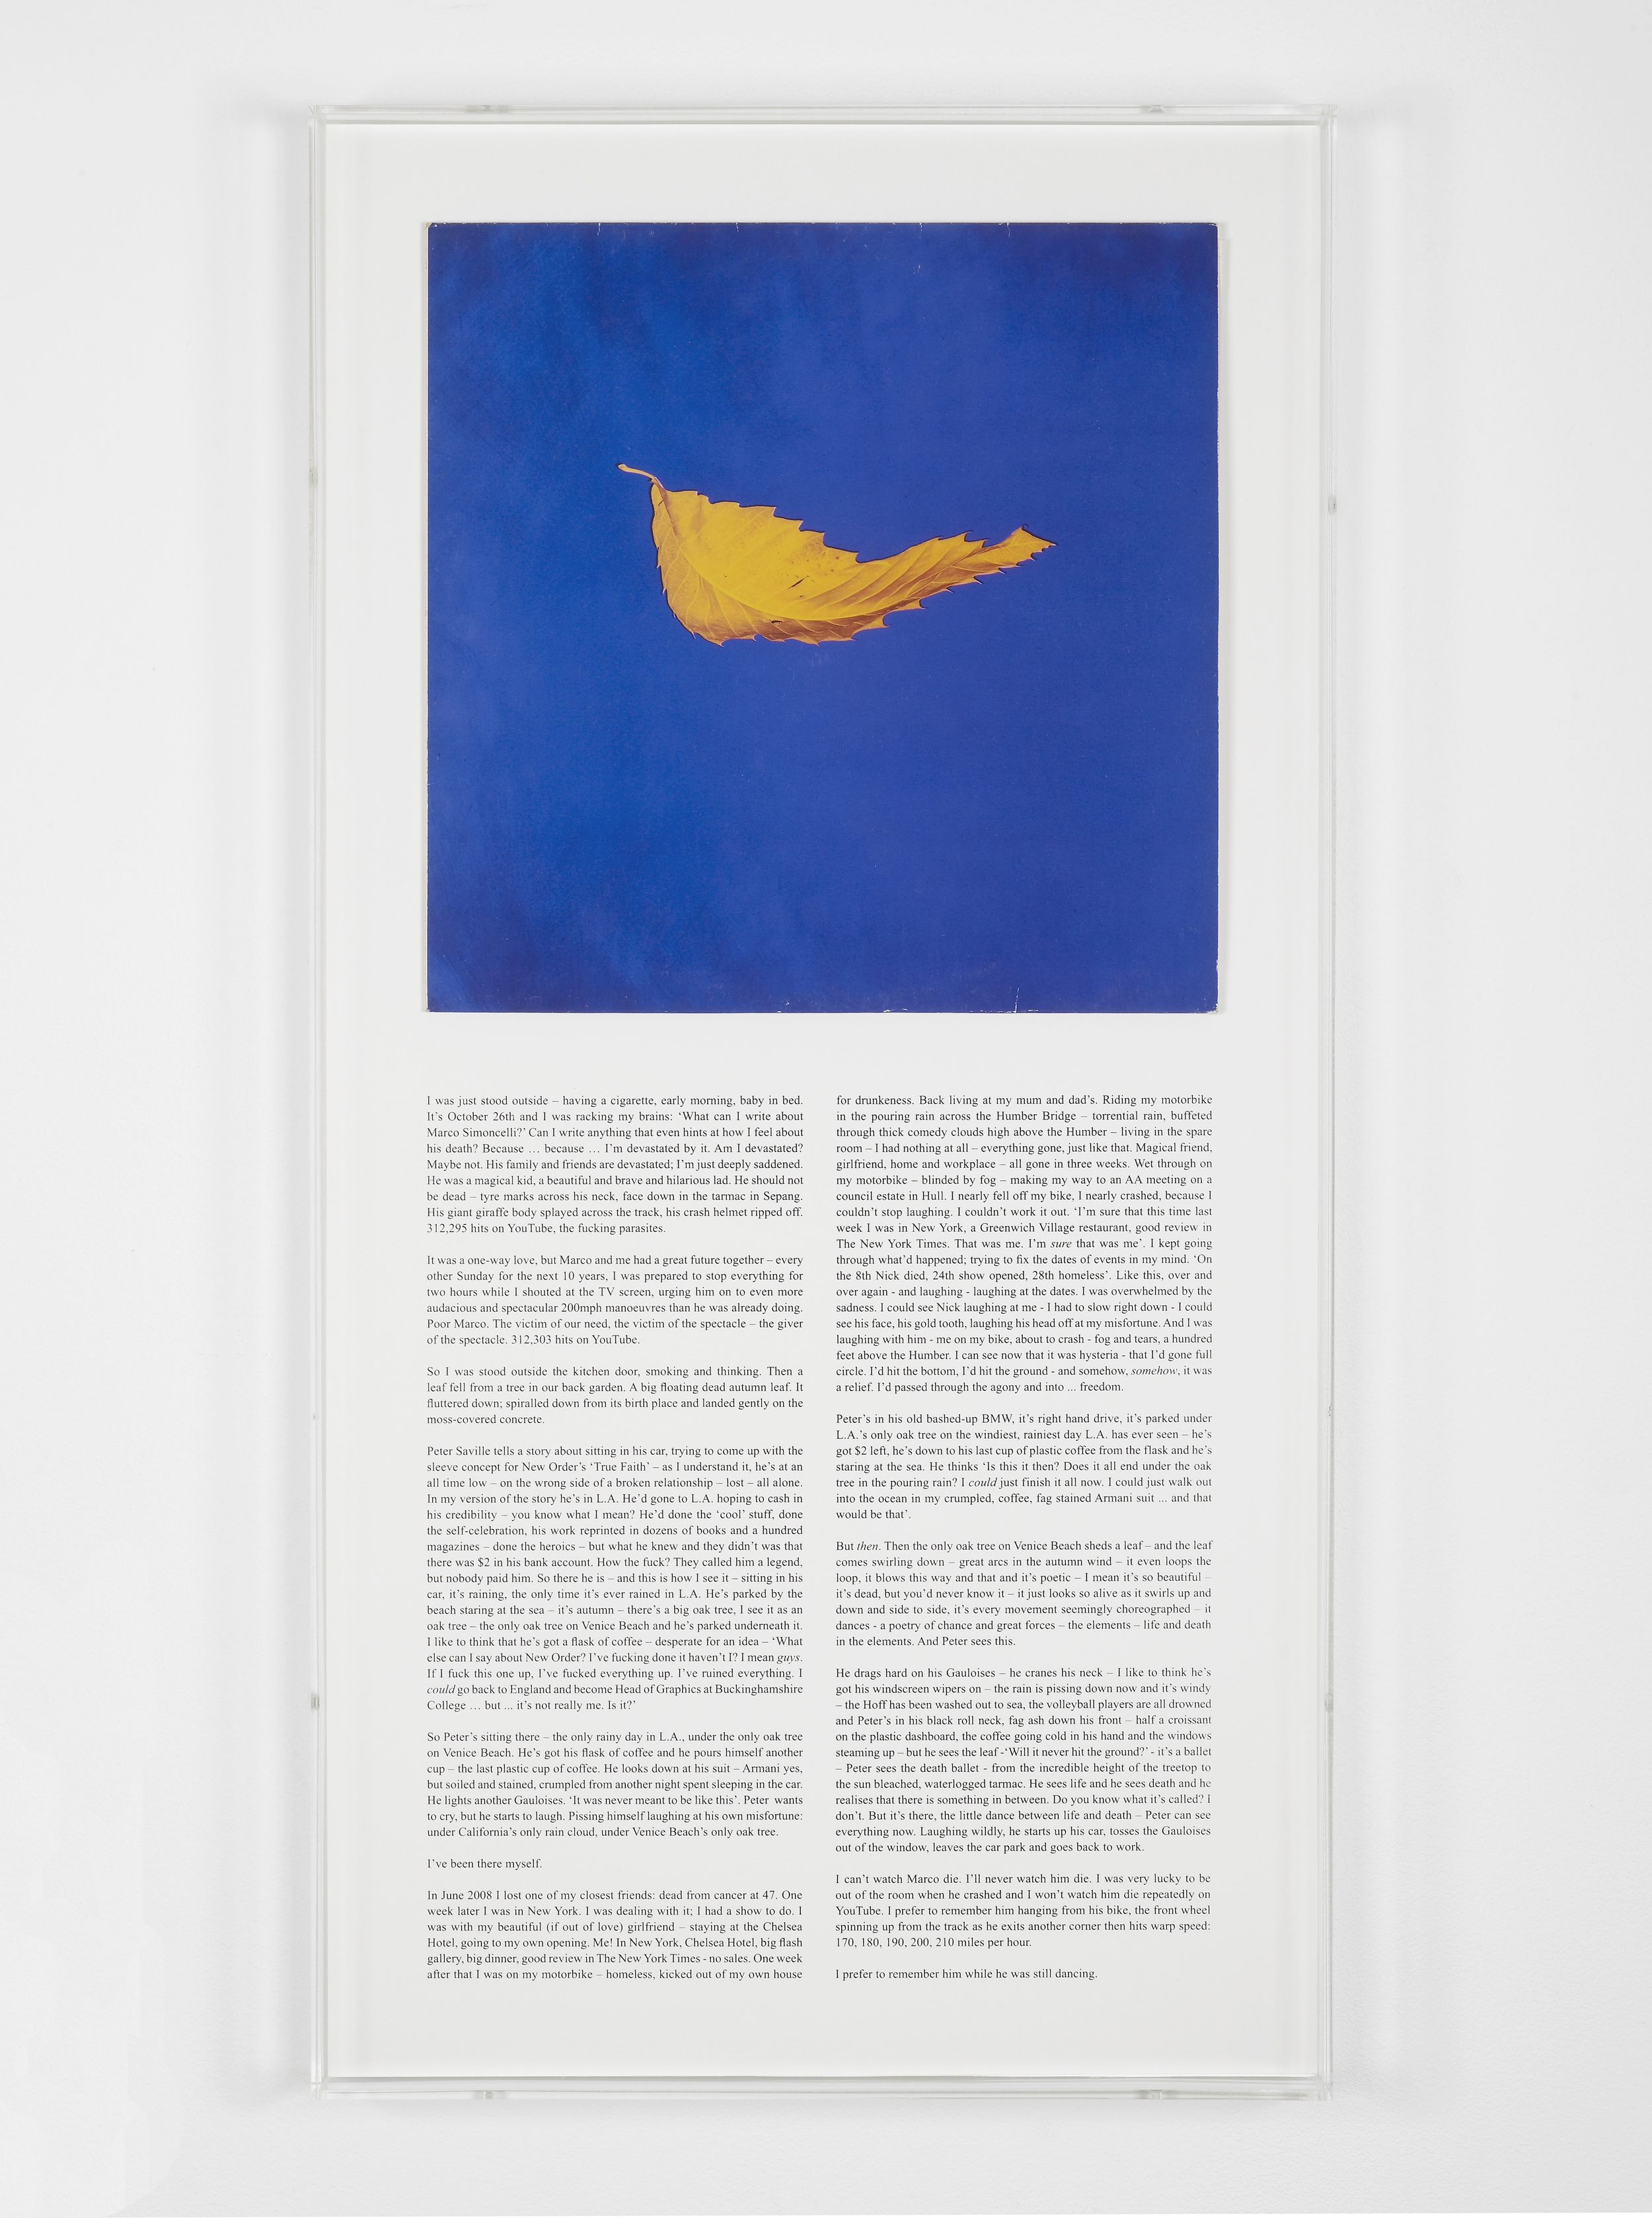 A History of Music (True Faith) 2012 Album cover, screenprint, perspex frame 79 x 40 cm / 31 x 15.7 in